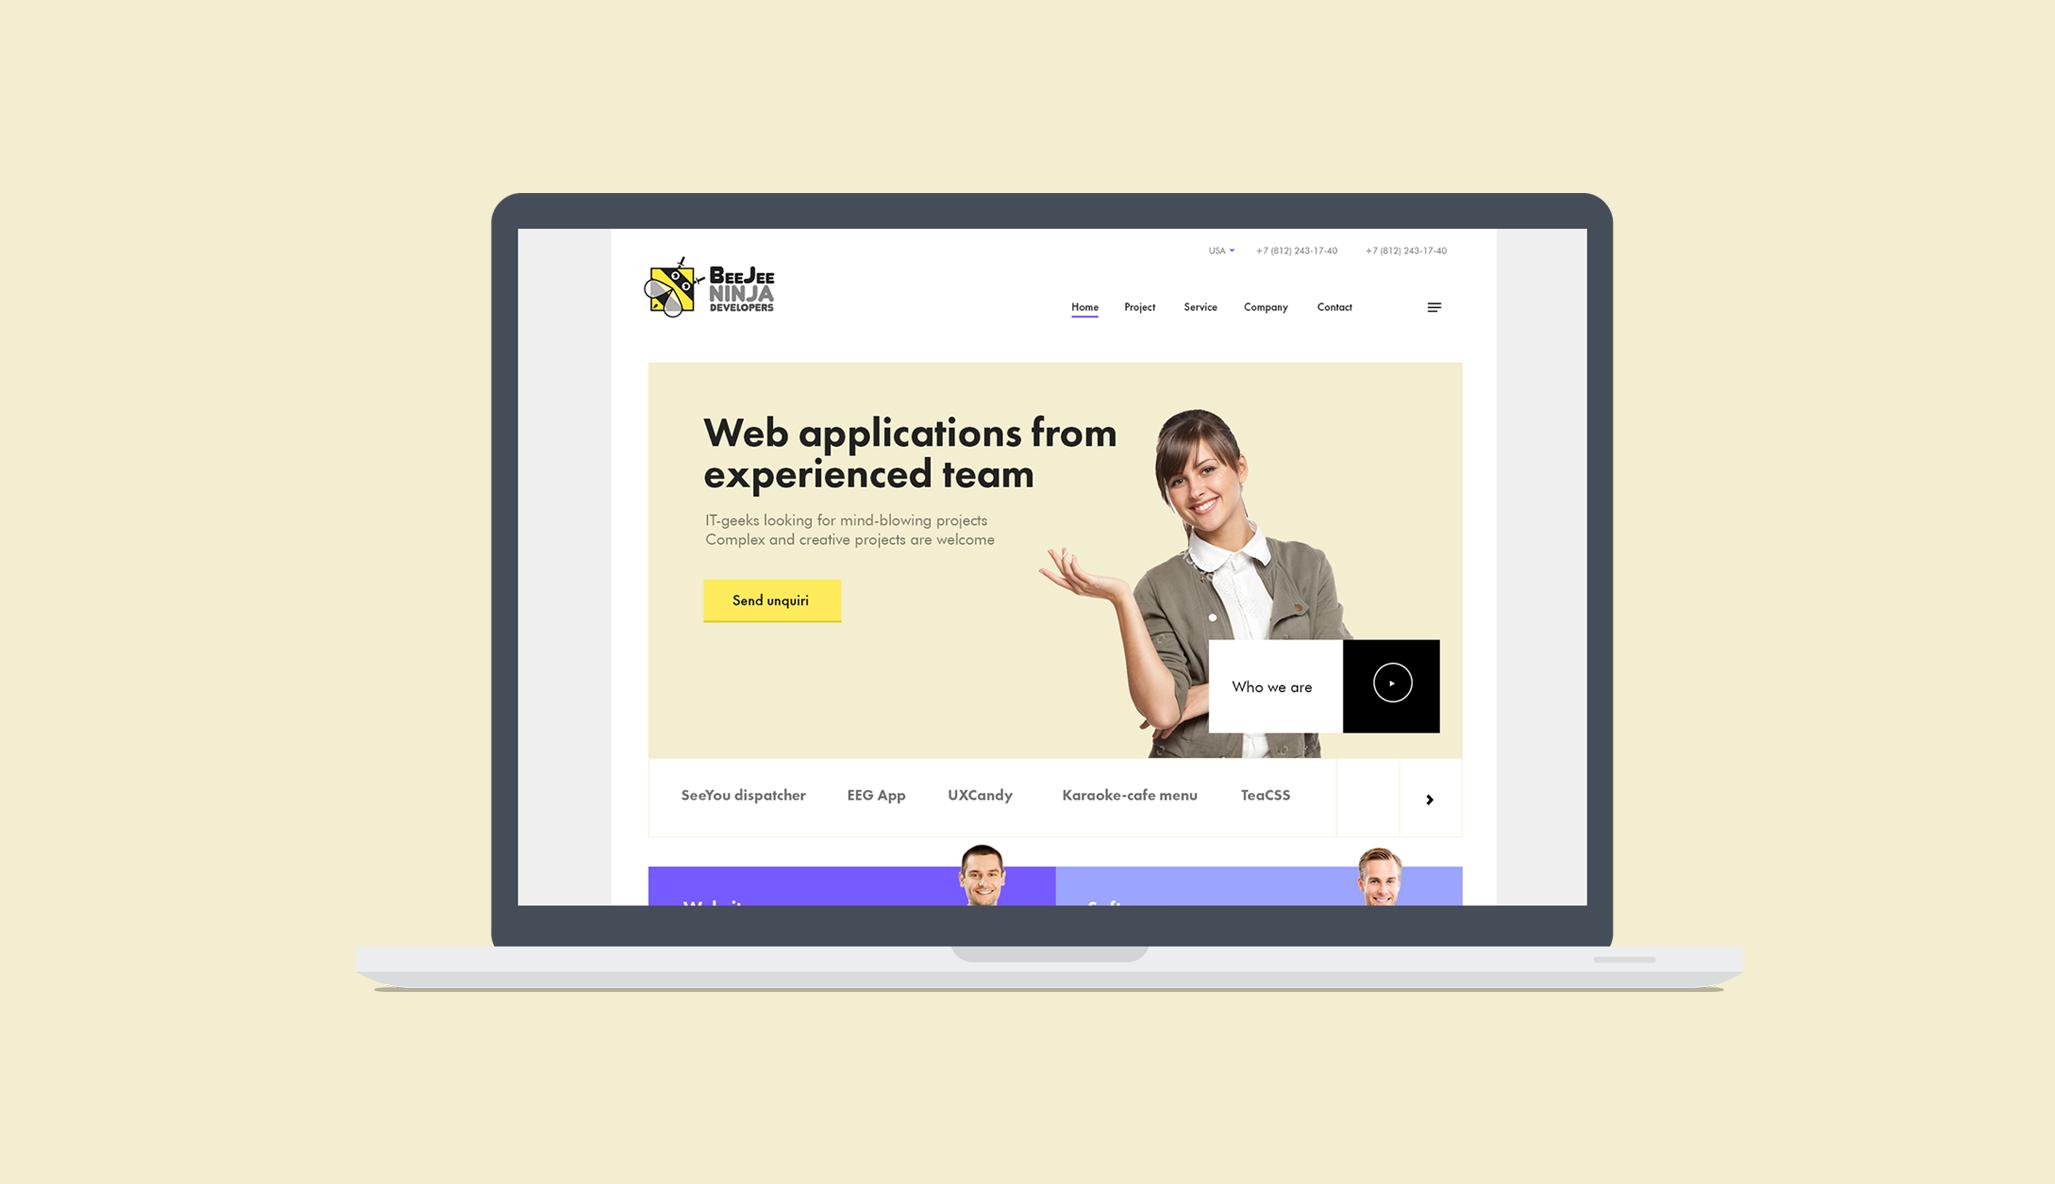 Концепт дизайна сайта в корпоративном стиле для IT компании фото f_202596d01743b8b6.png